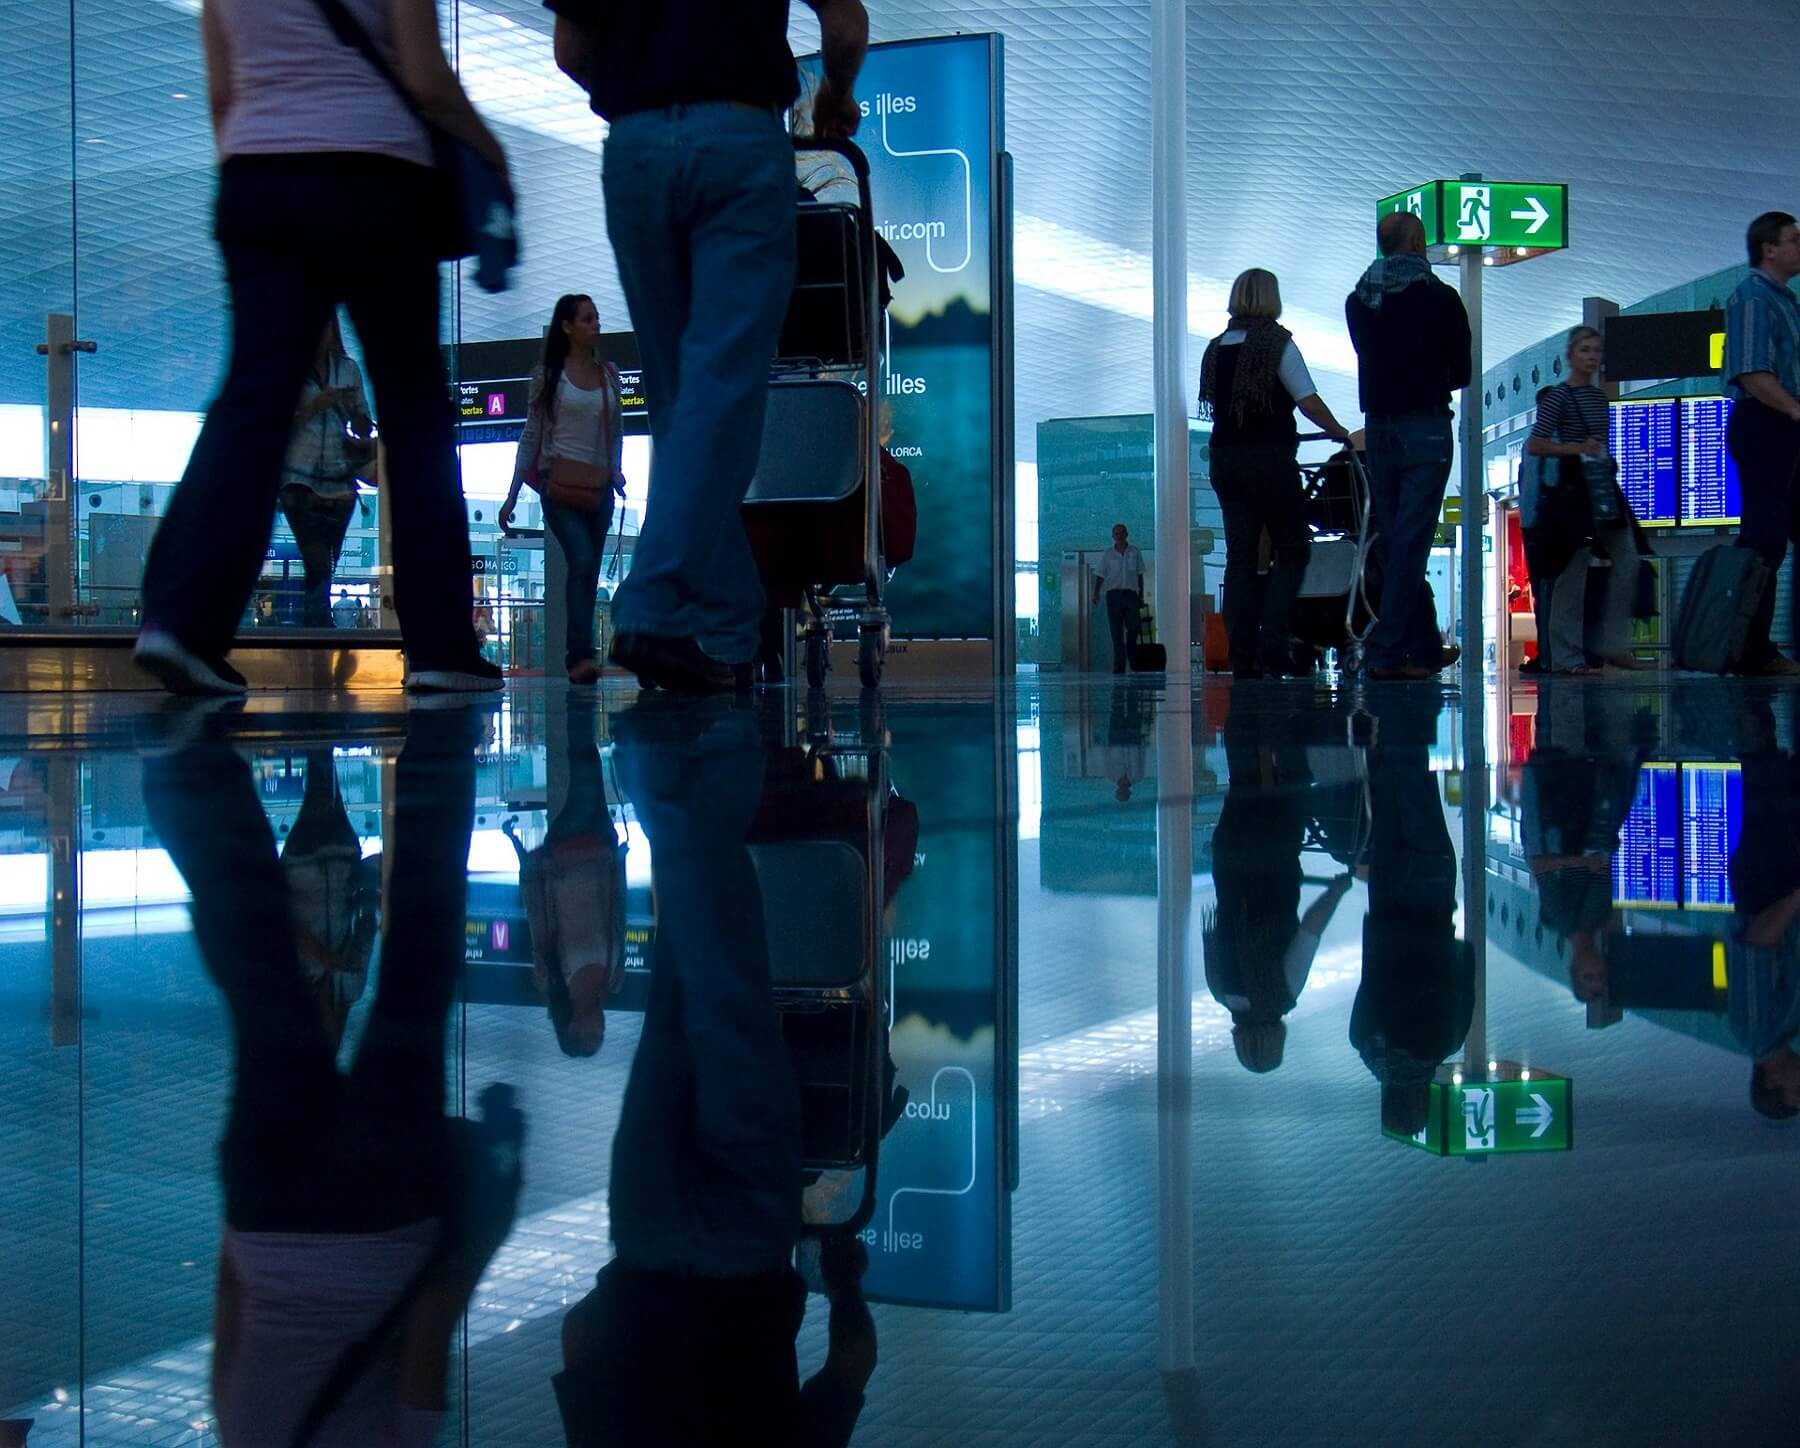 Airport Transfers Horton Kirby